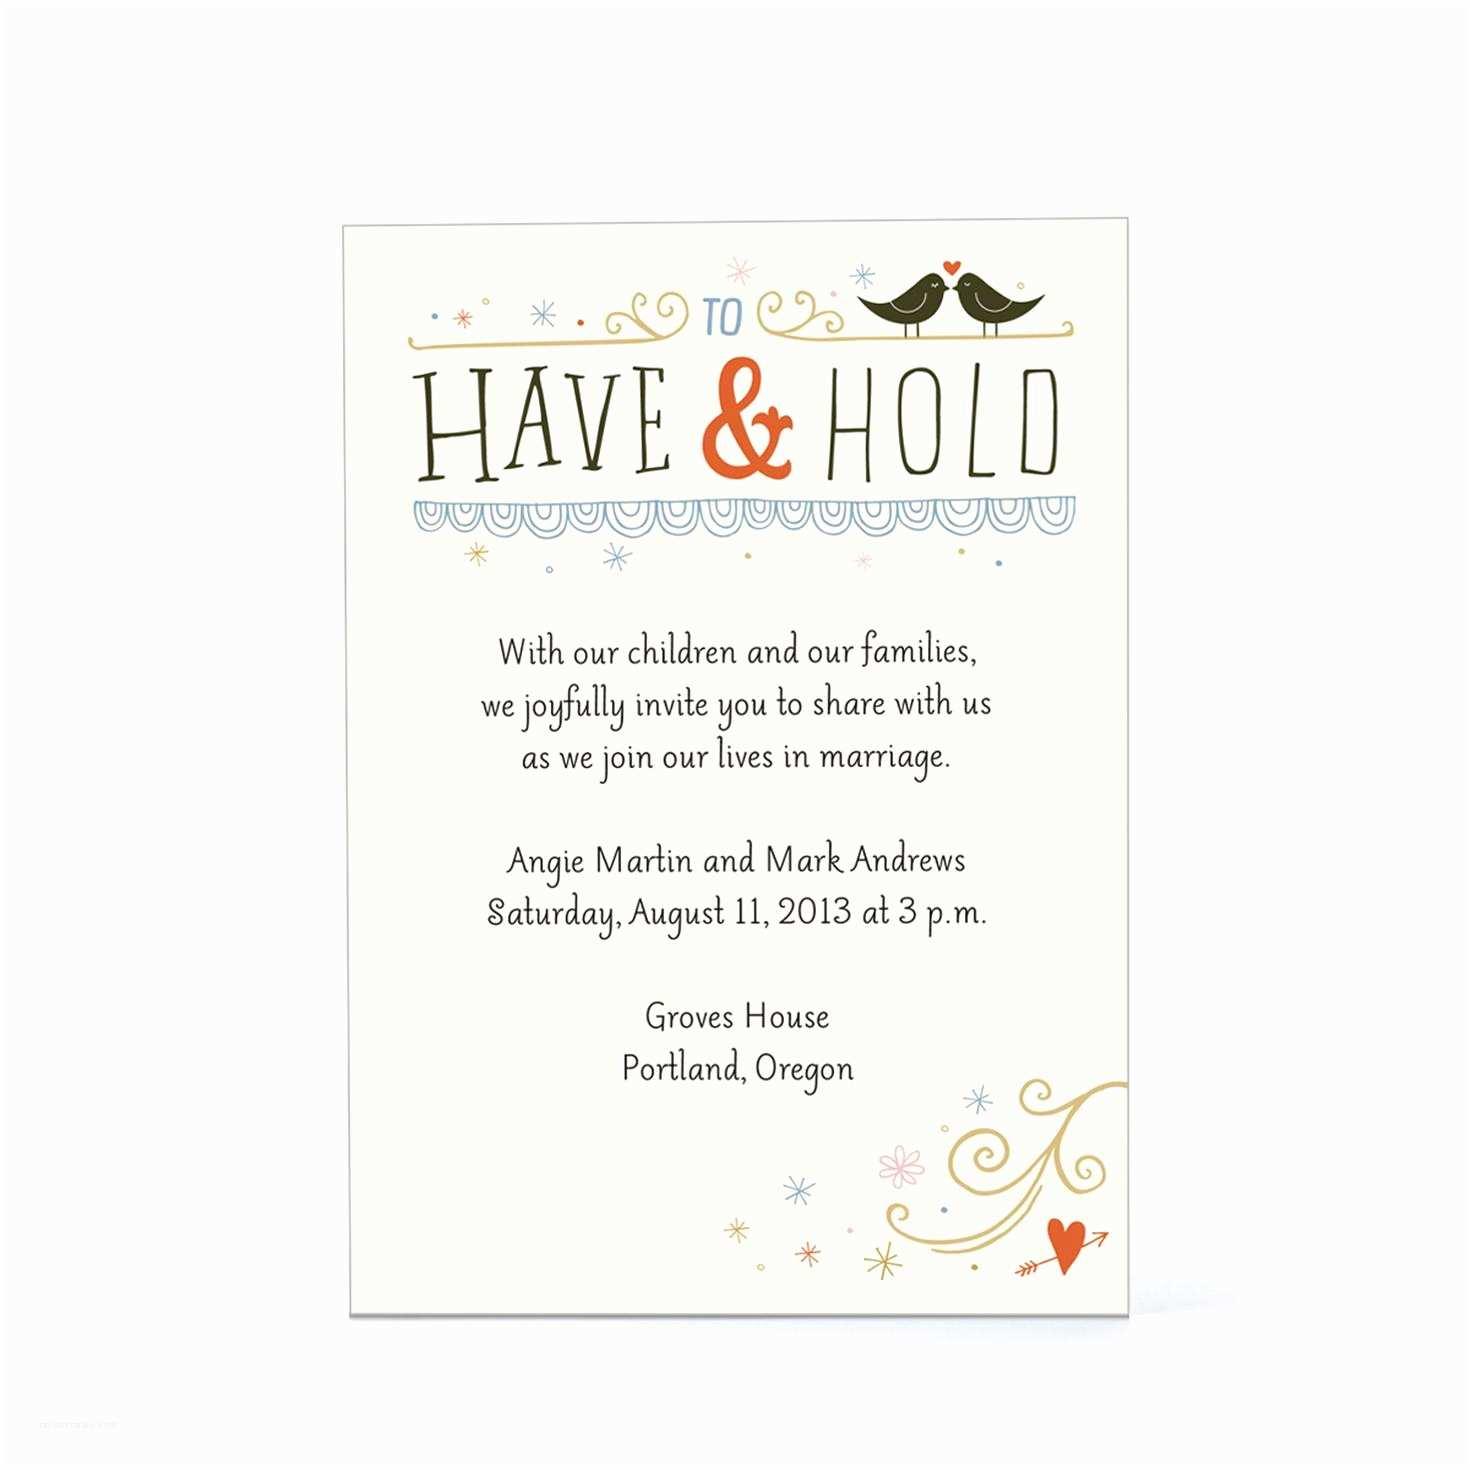 Hallmark Wedding Invitations 9 Best Of Hallmark Printable Wedding Invitation